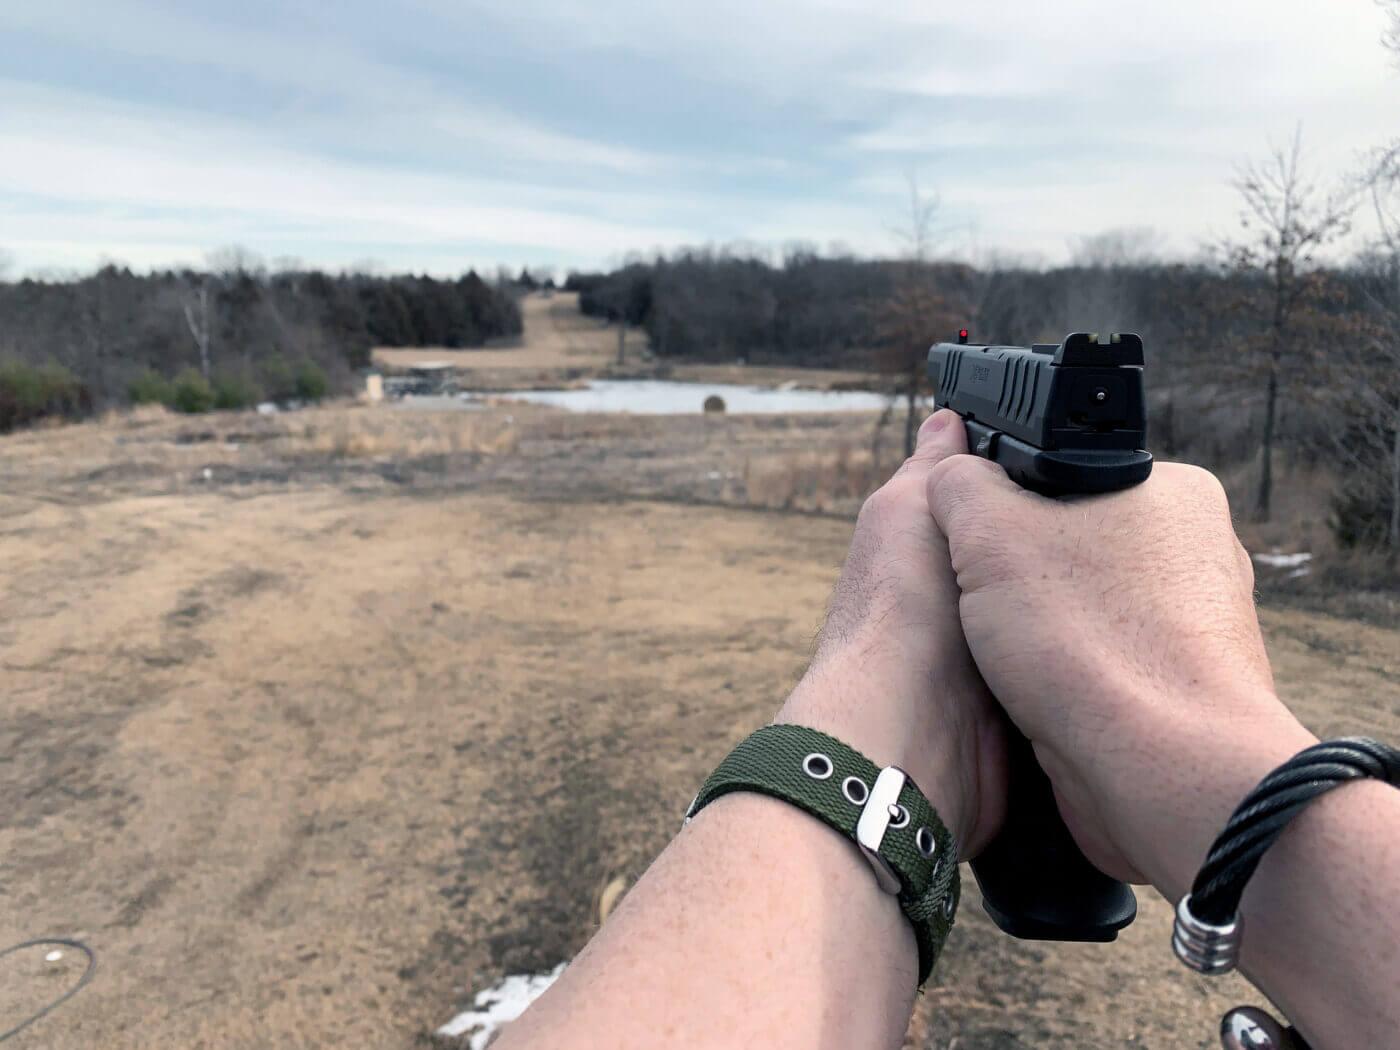 Long distance pistol shooting